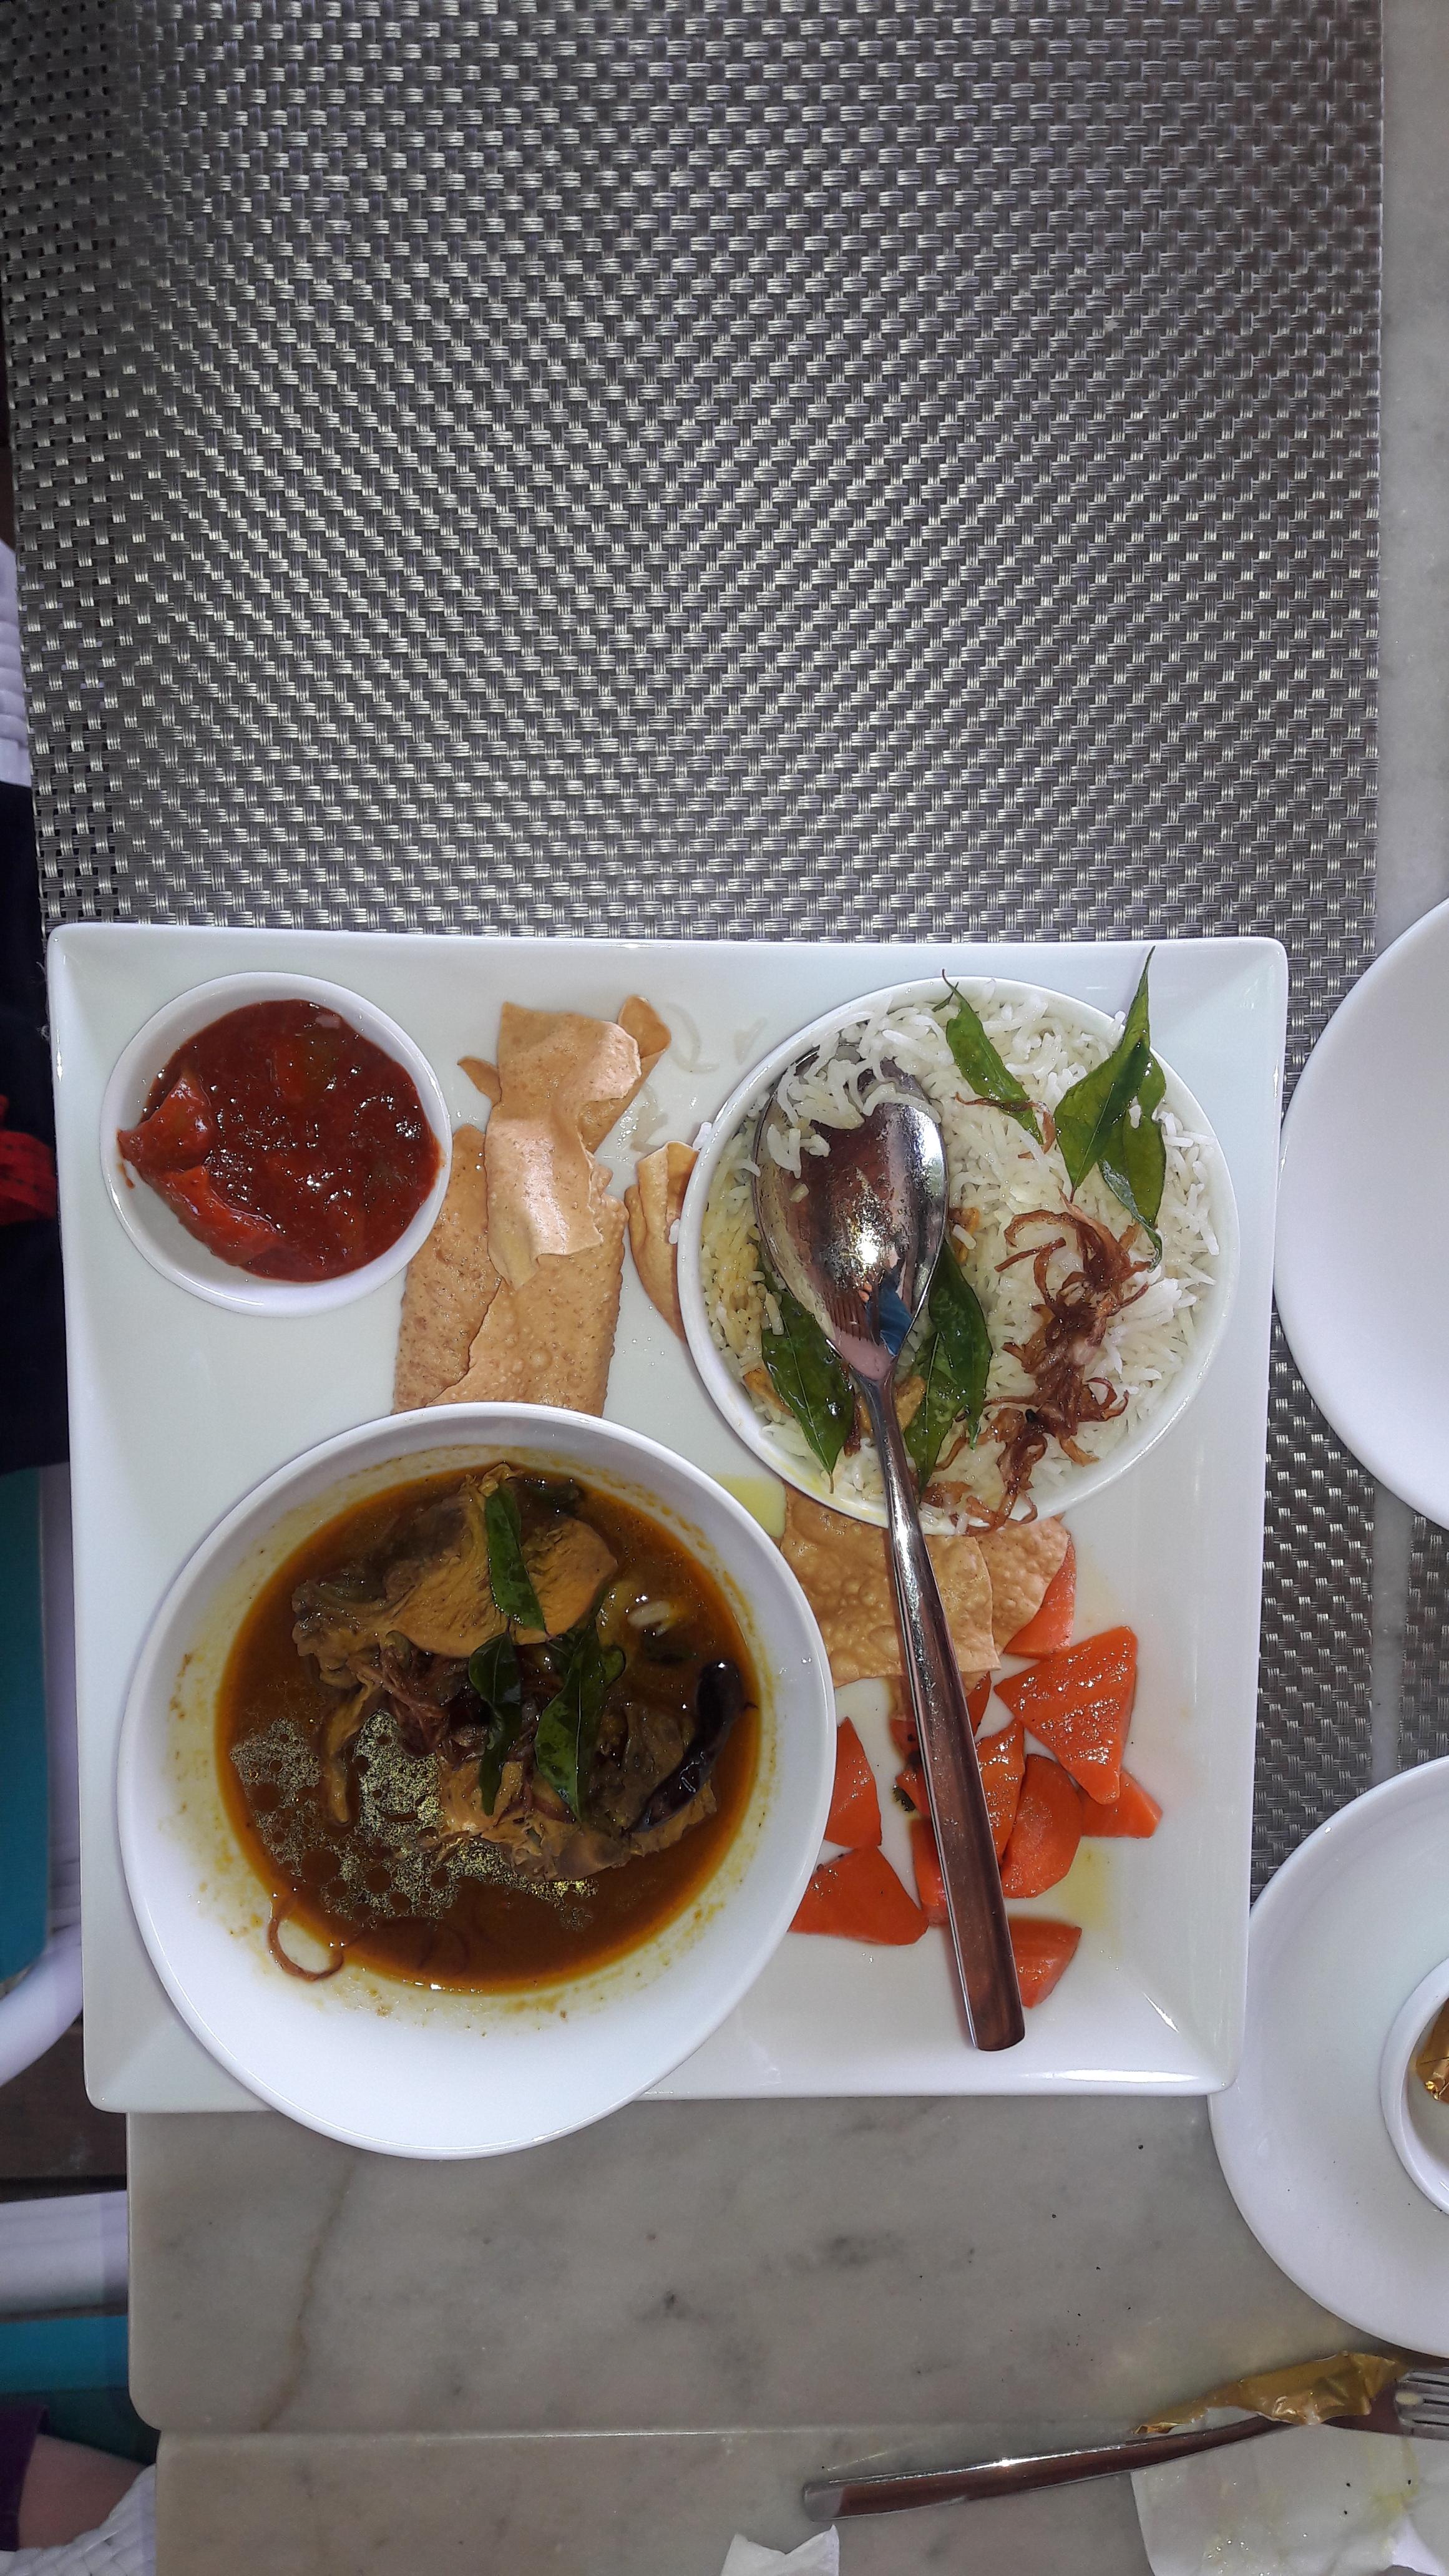 Maldivian Chicken curry for lunch!